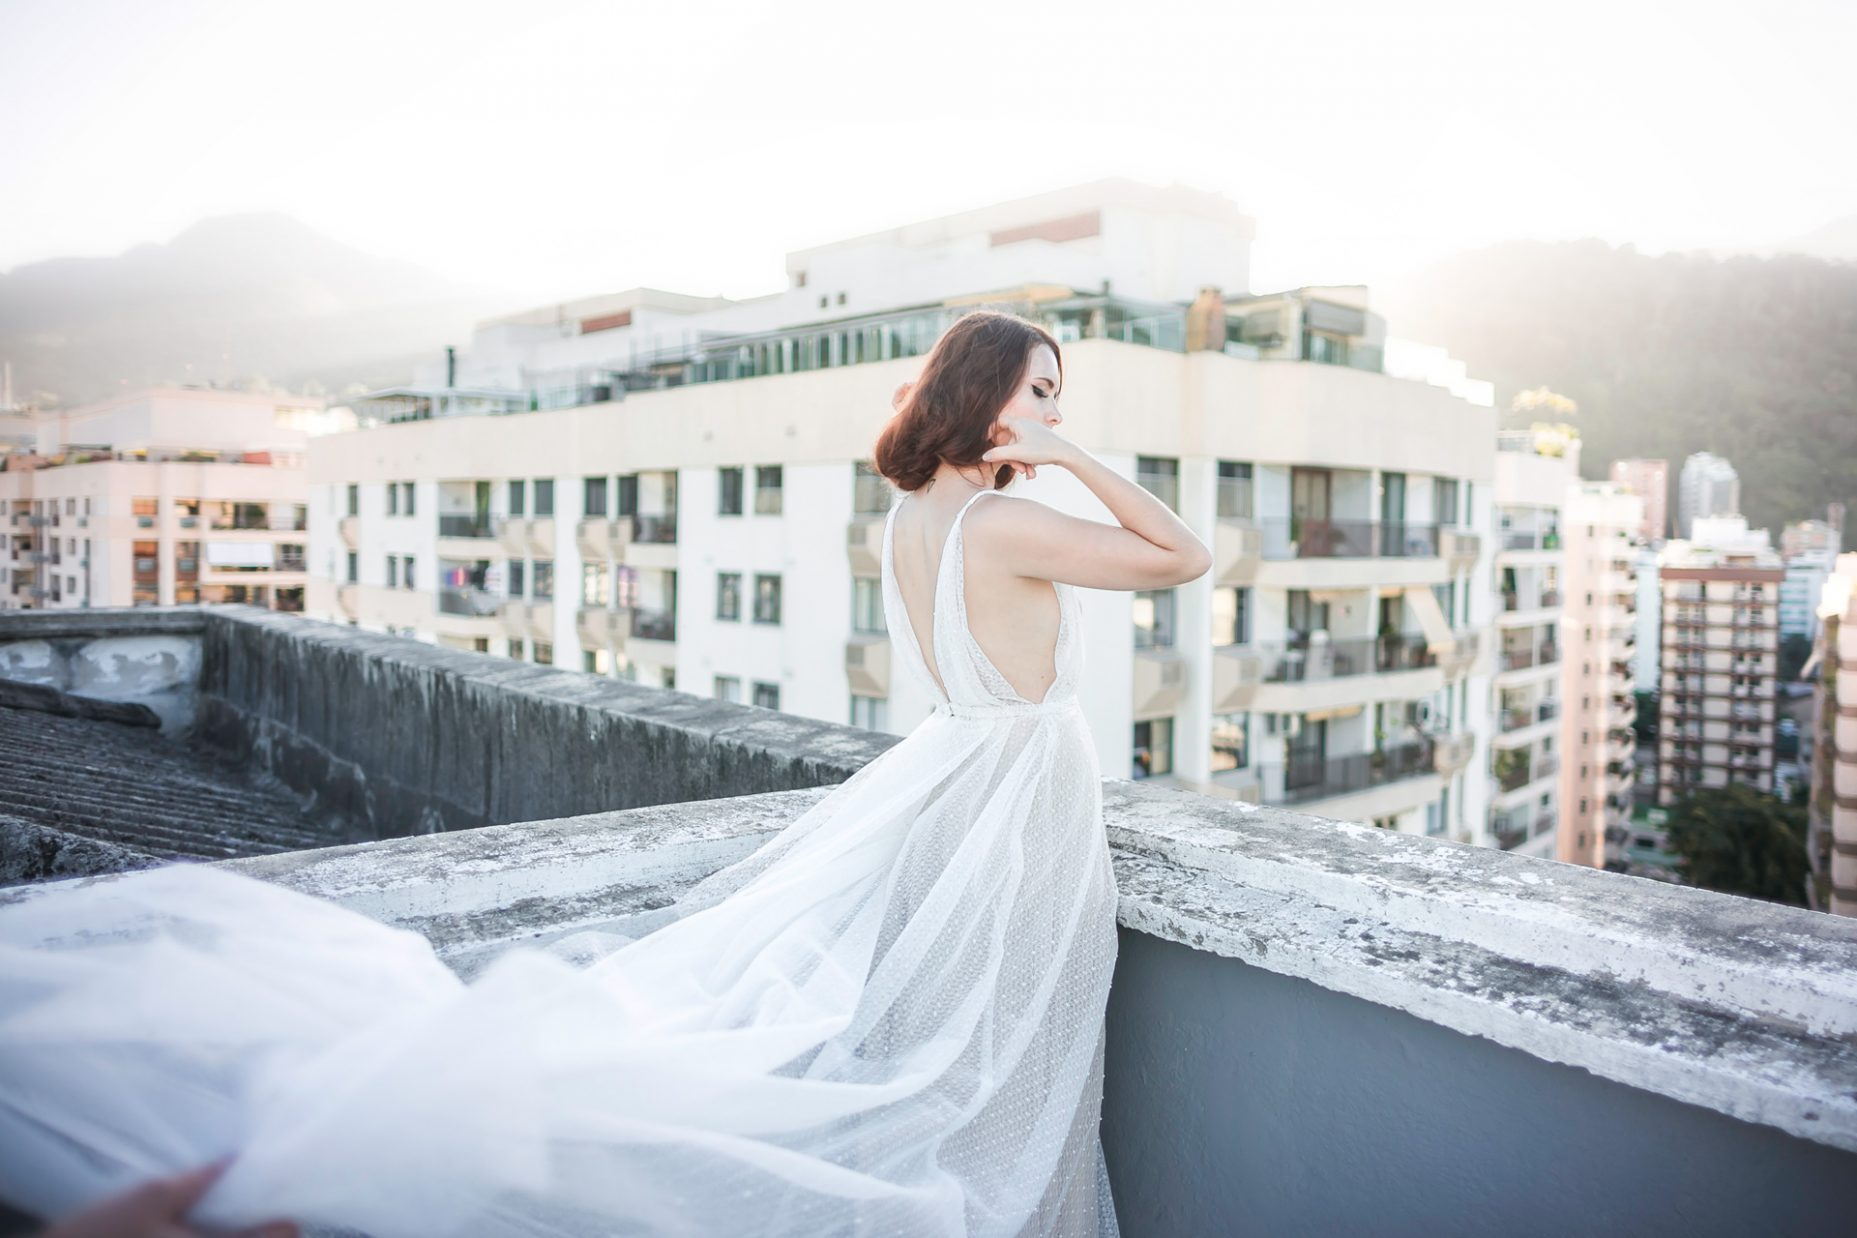 Atelier_fafi_vasconcellos_editorial_rooftop_noivas_sharon_eve_smith_giselly_goncalves_1_v2